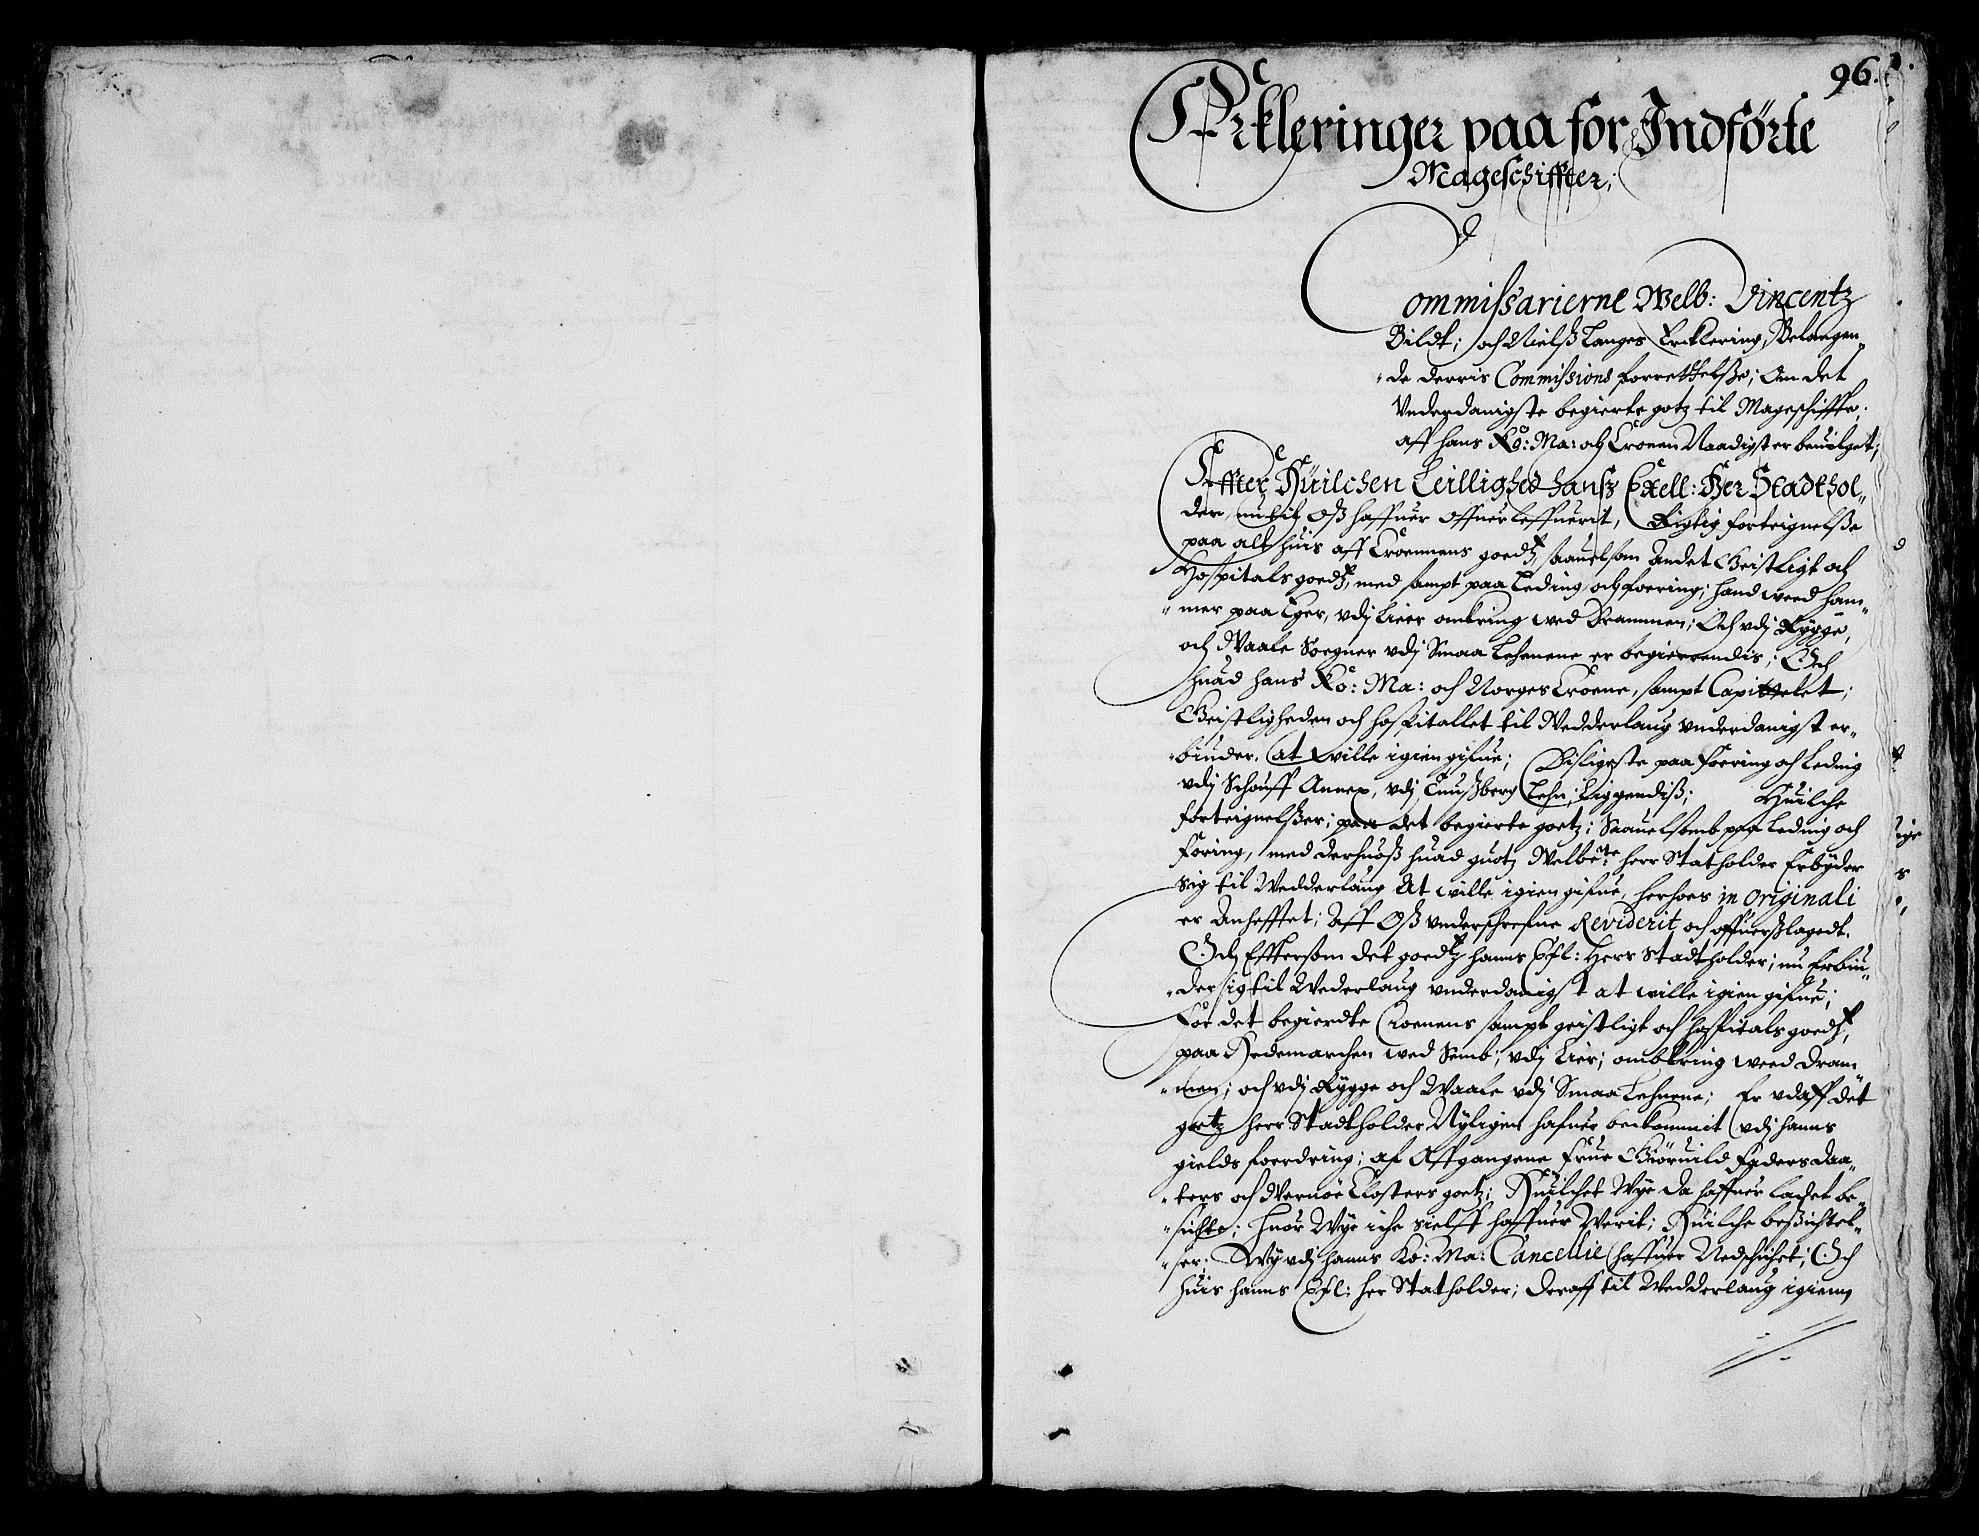 RA, Rentekammeret inntil 1814, Realistisk ordnet avdeling, On/L0001: Statens gods, 1651, s. 94b-95a